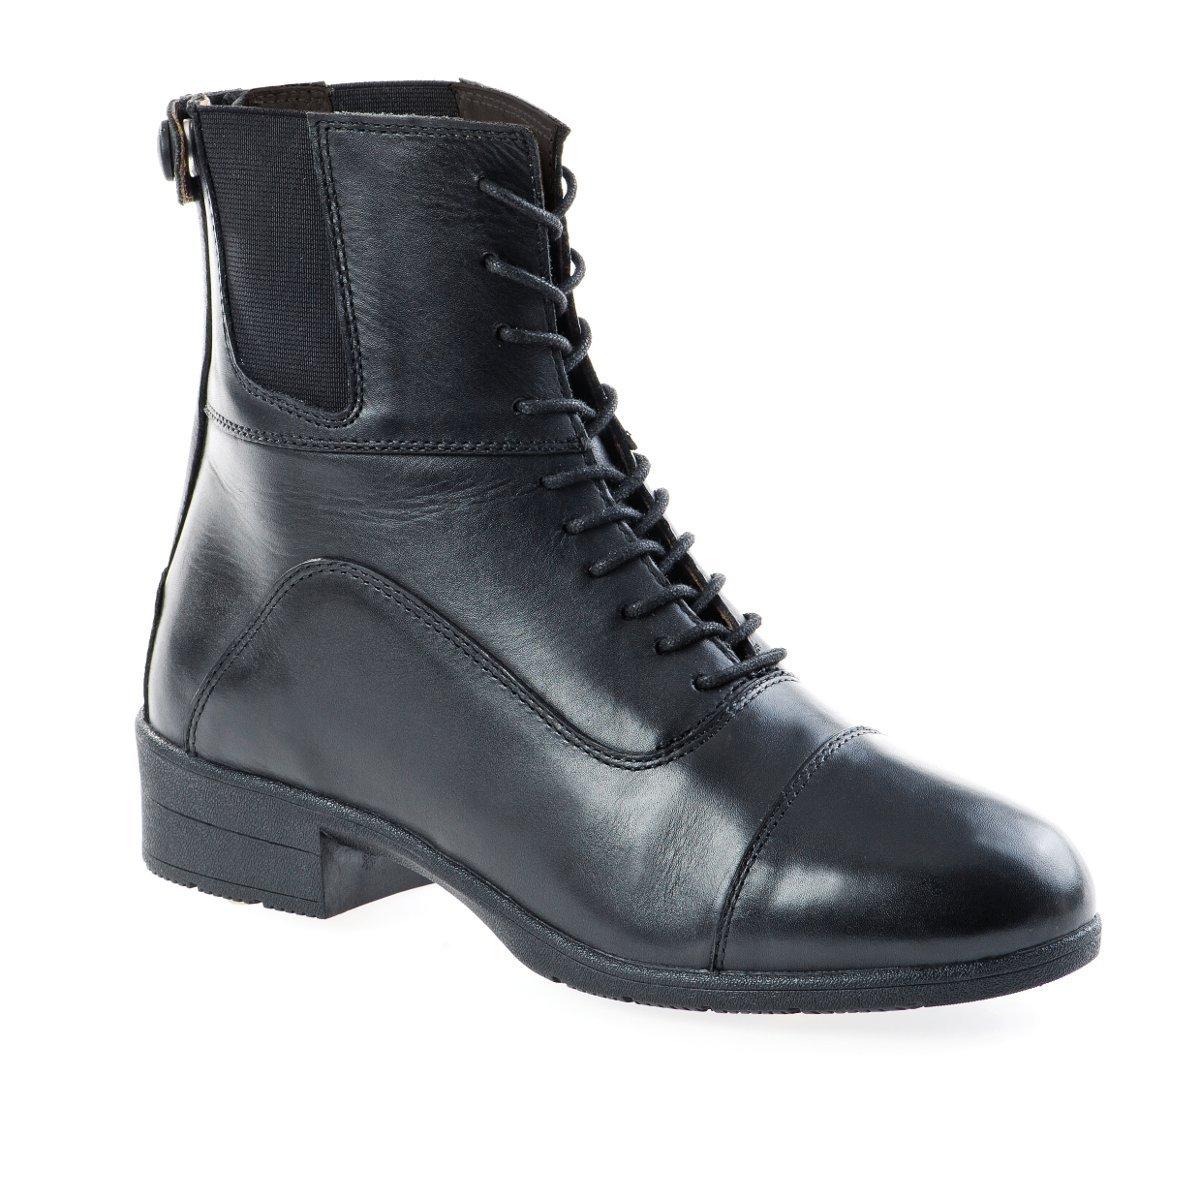 SUEDWIND - Stiefel Ancona CONTRACE Waterproof - schwarz